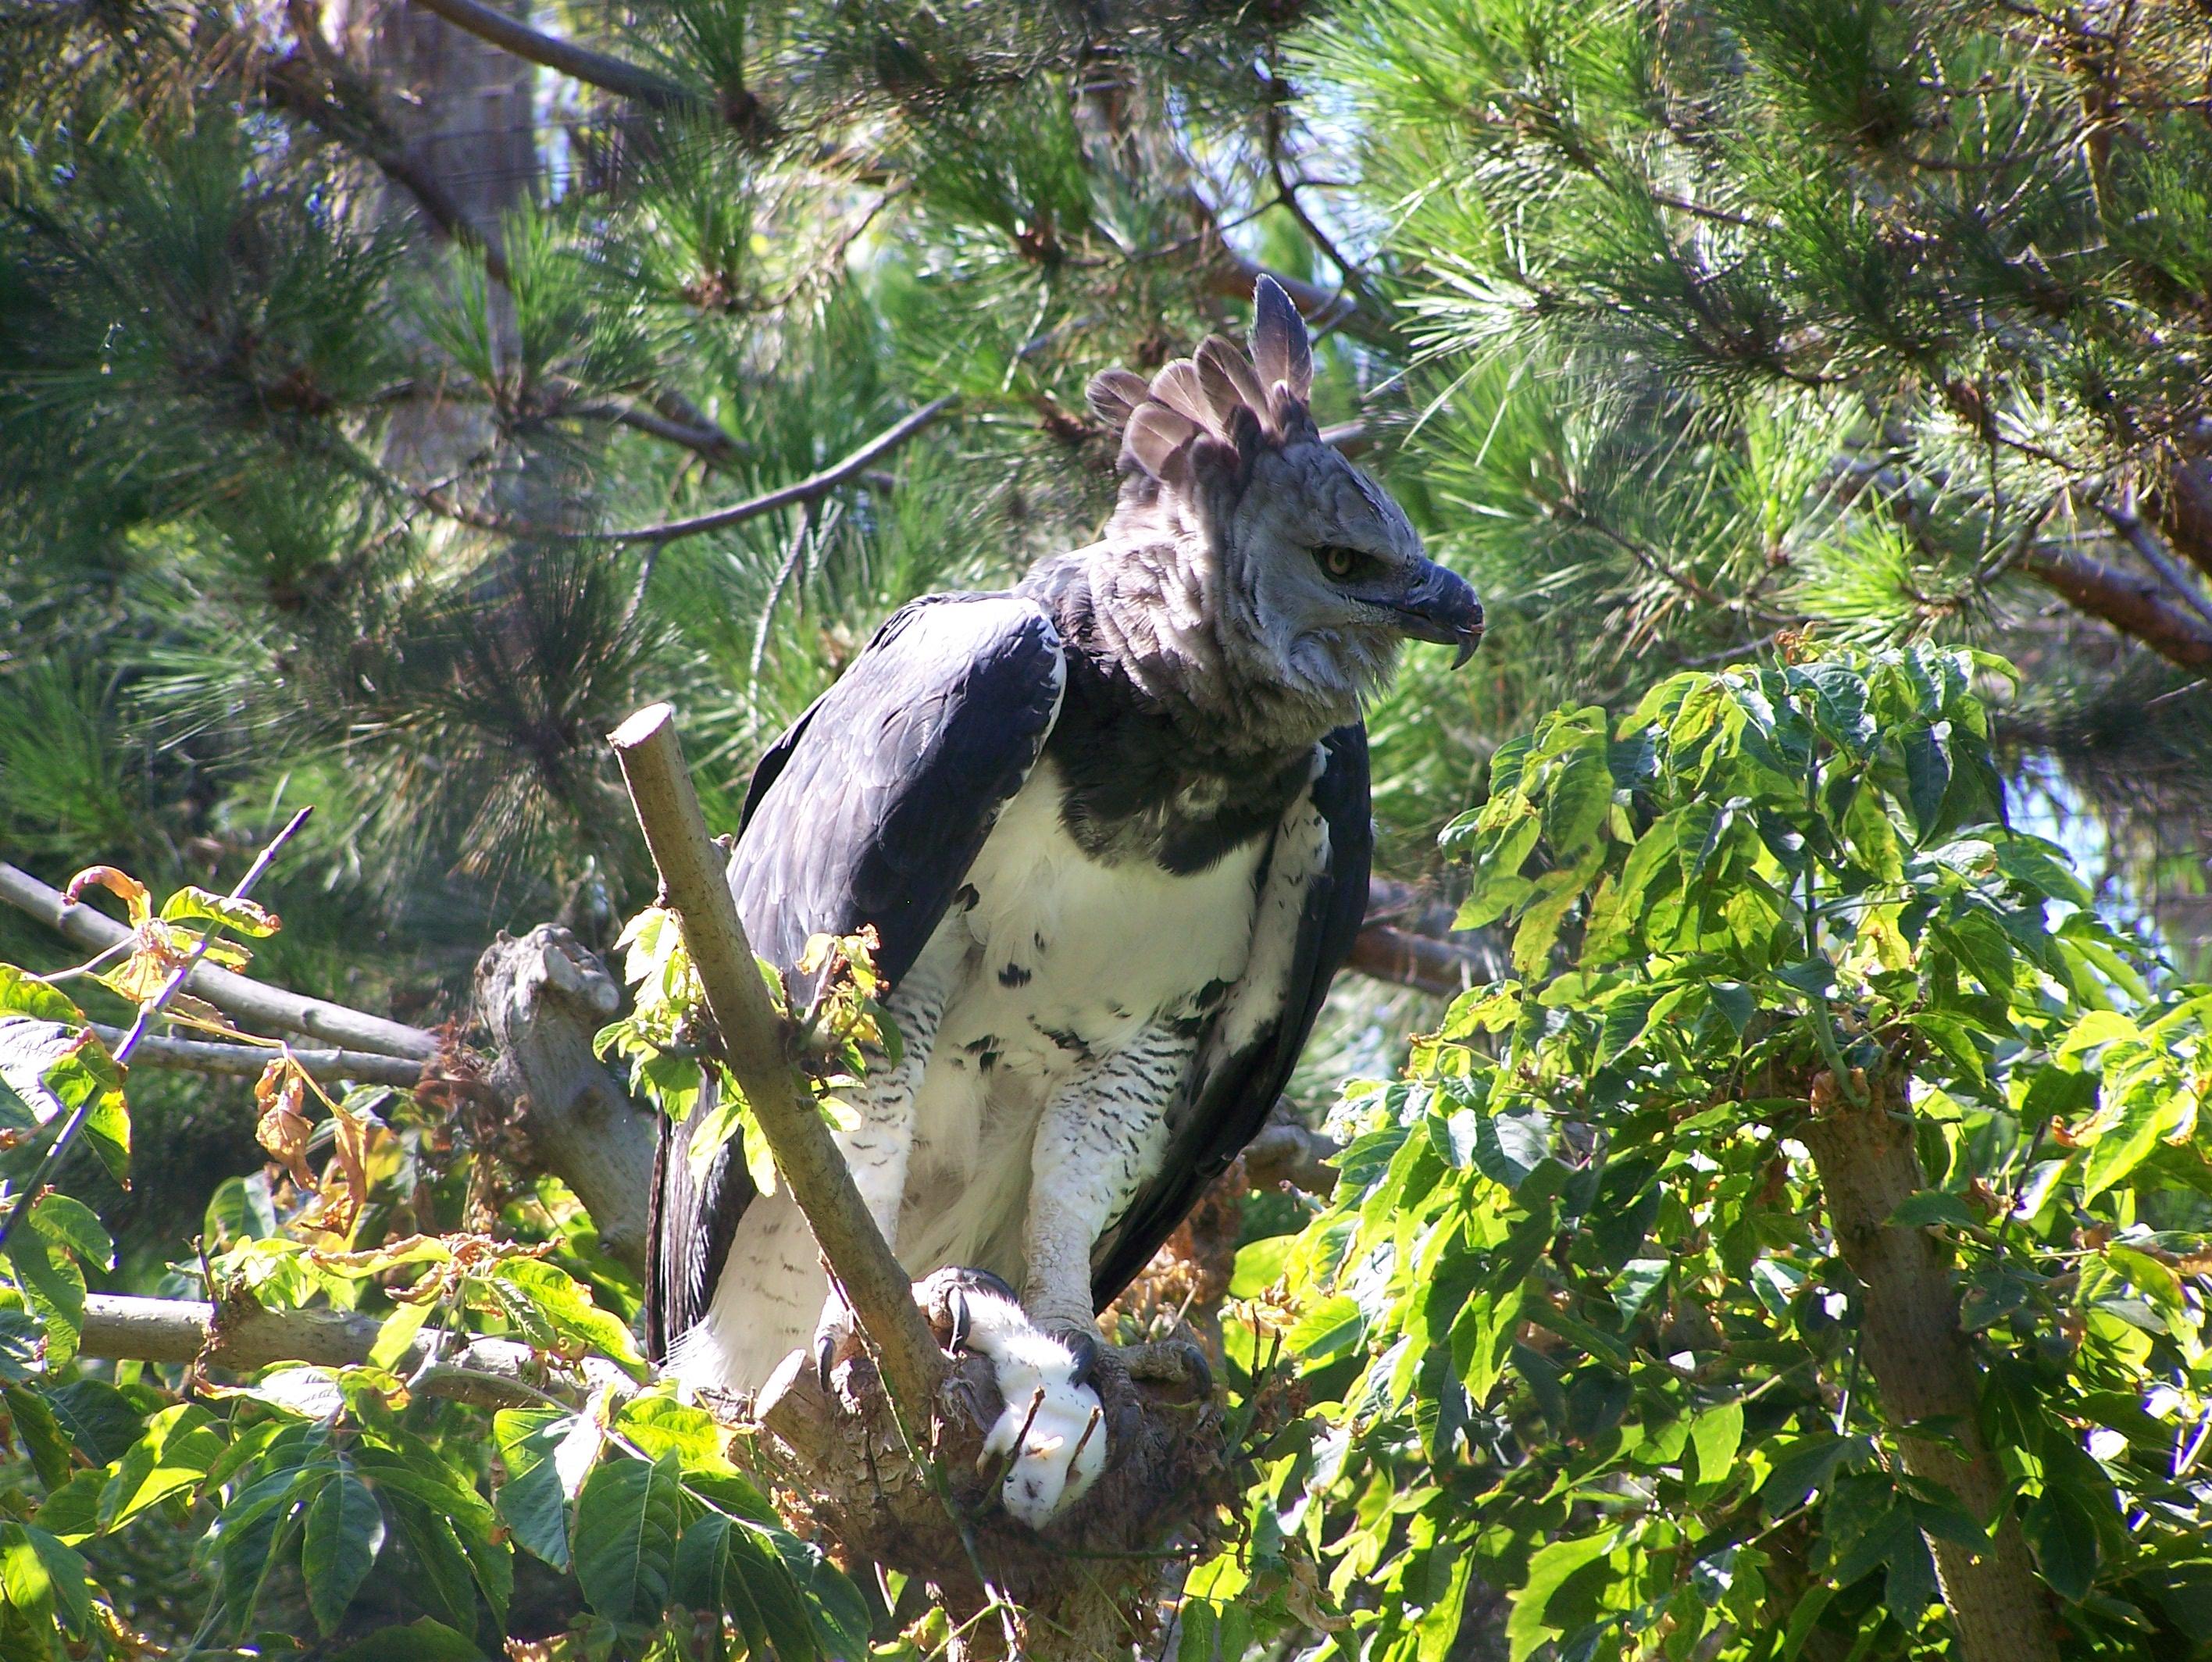 american harpy eagle speak up for the voiceless international